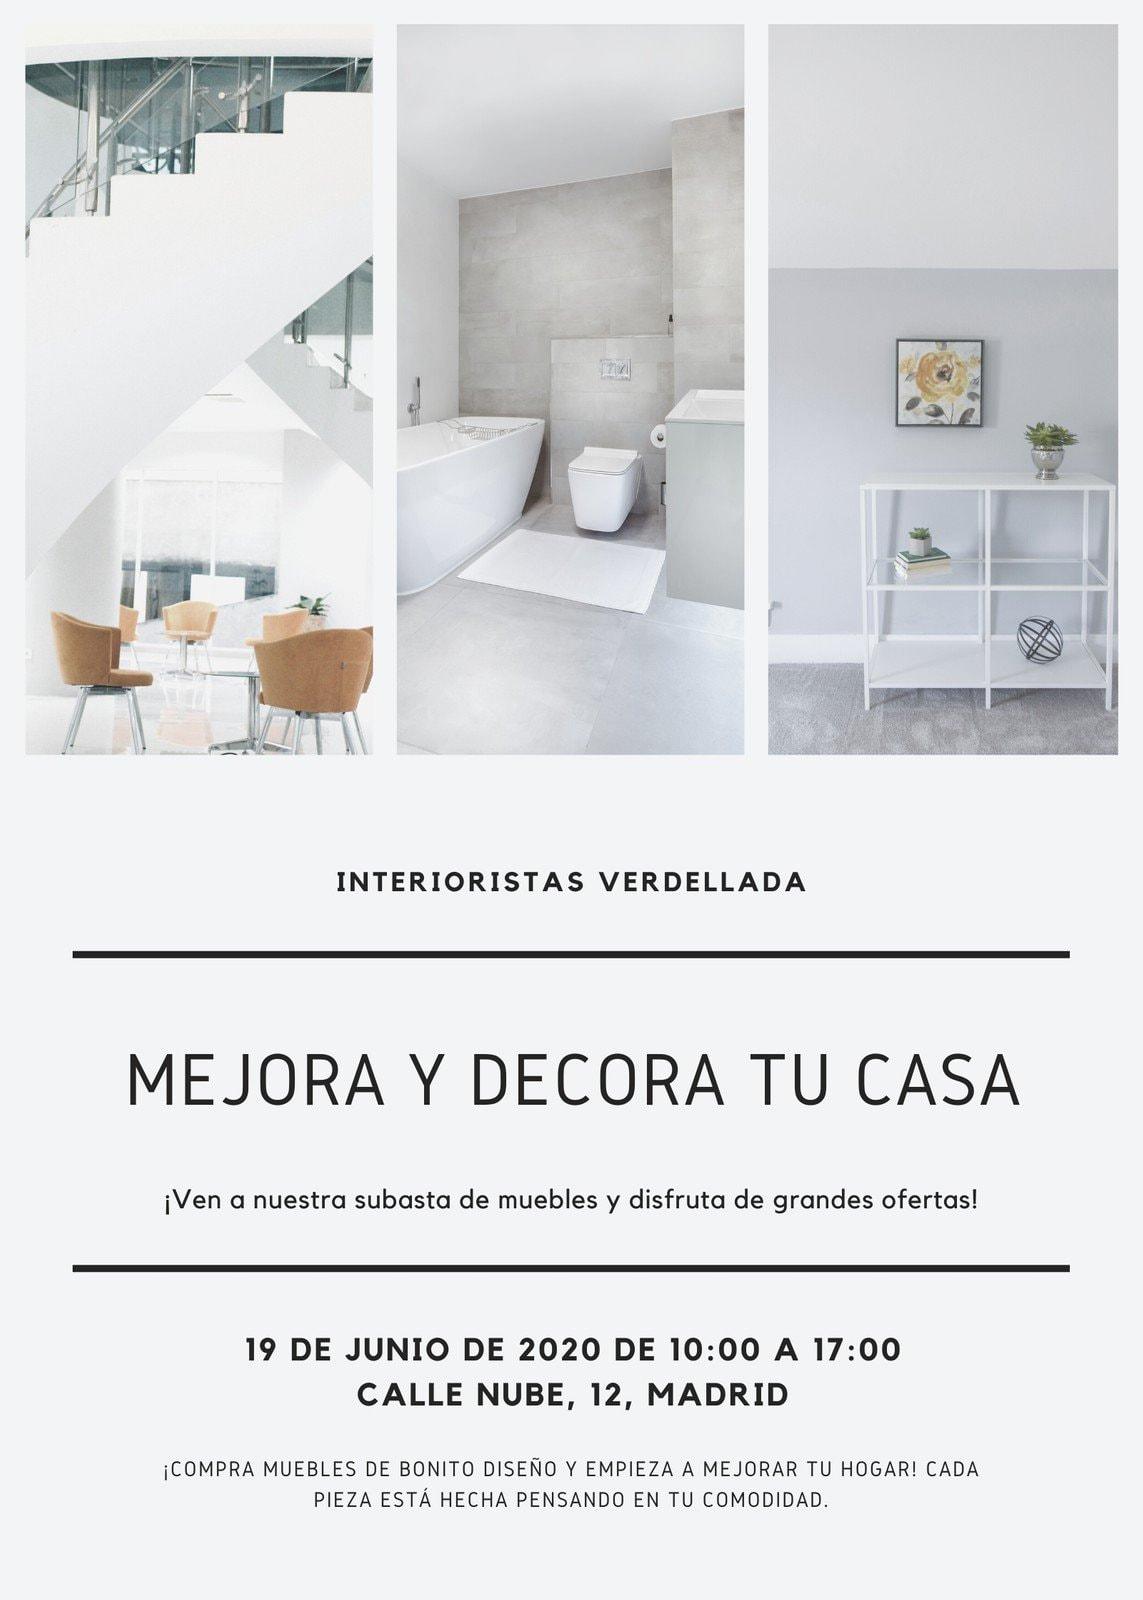 Folleto de Producto Foto Interior Minimalista Blanco